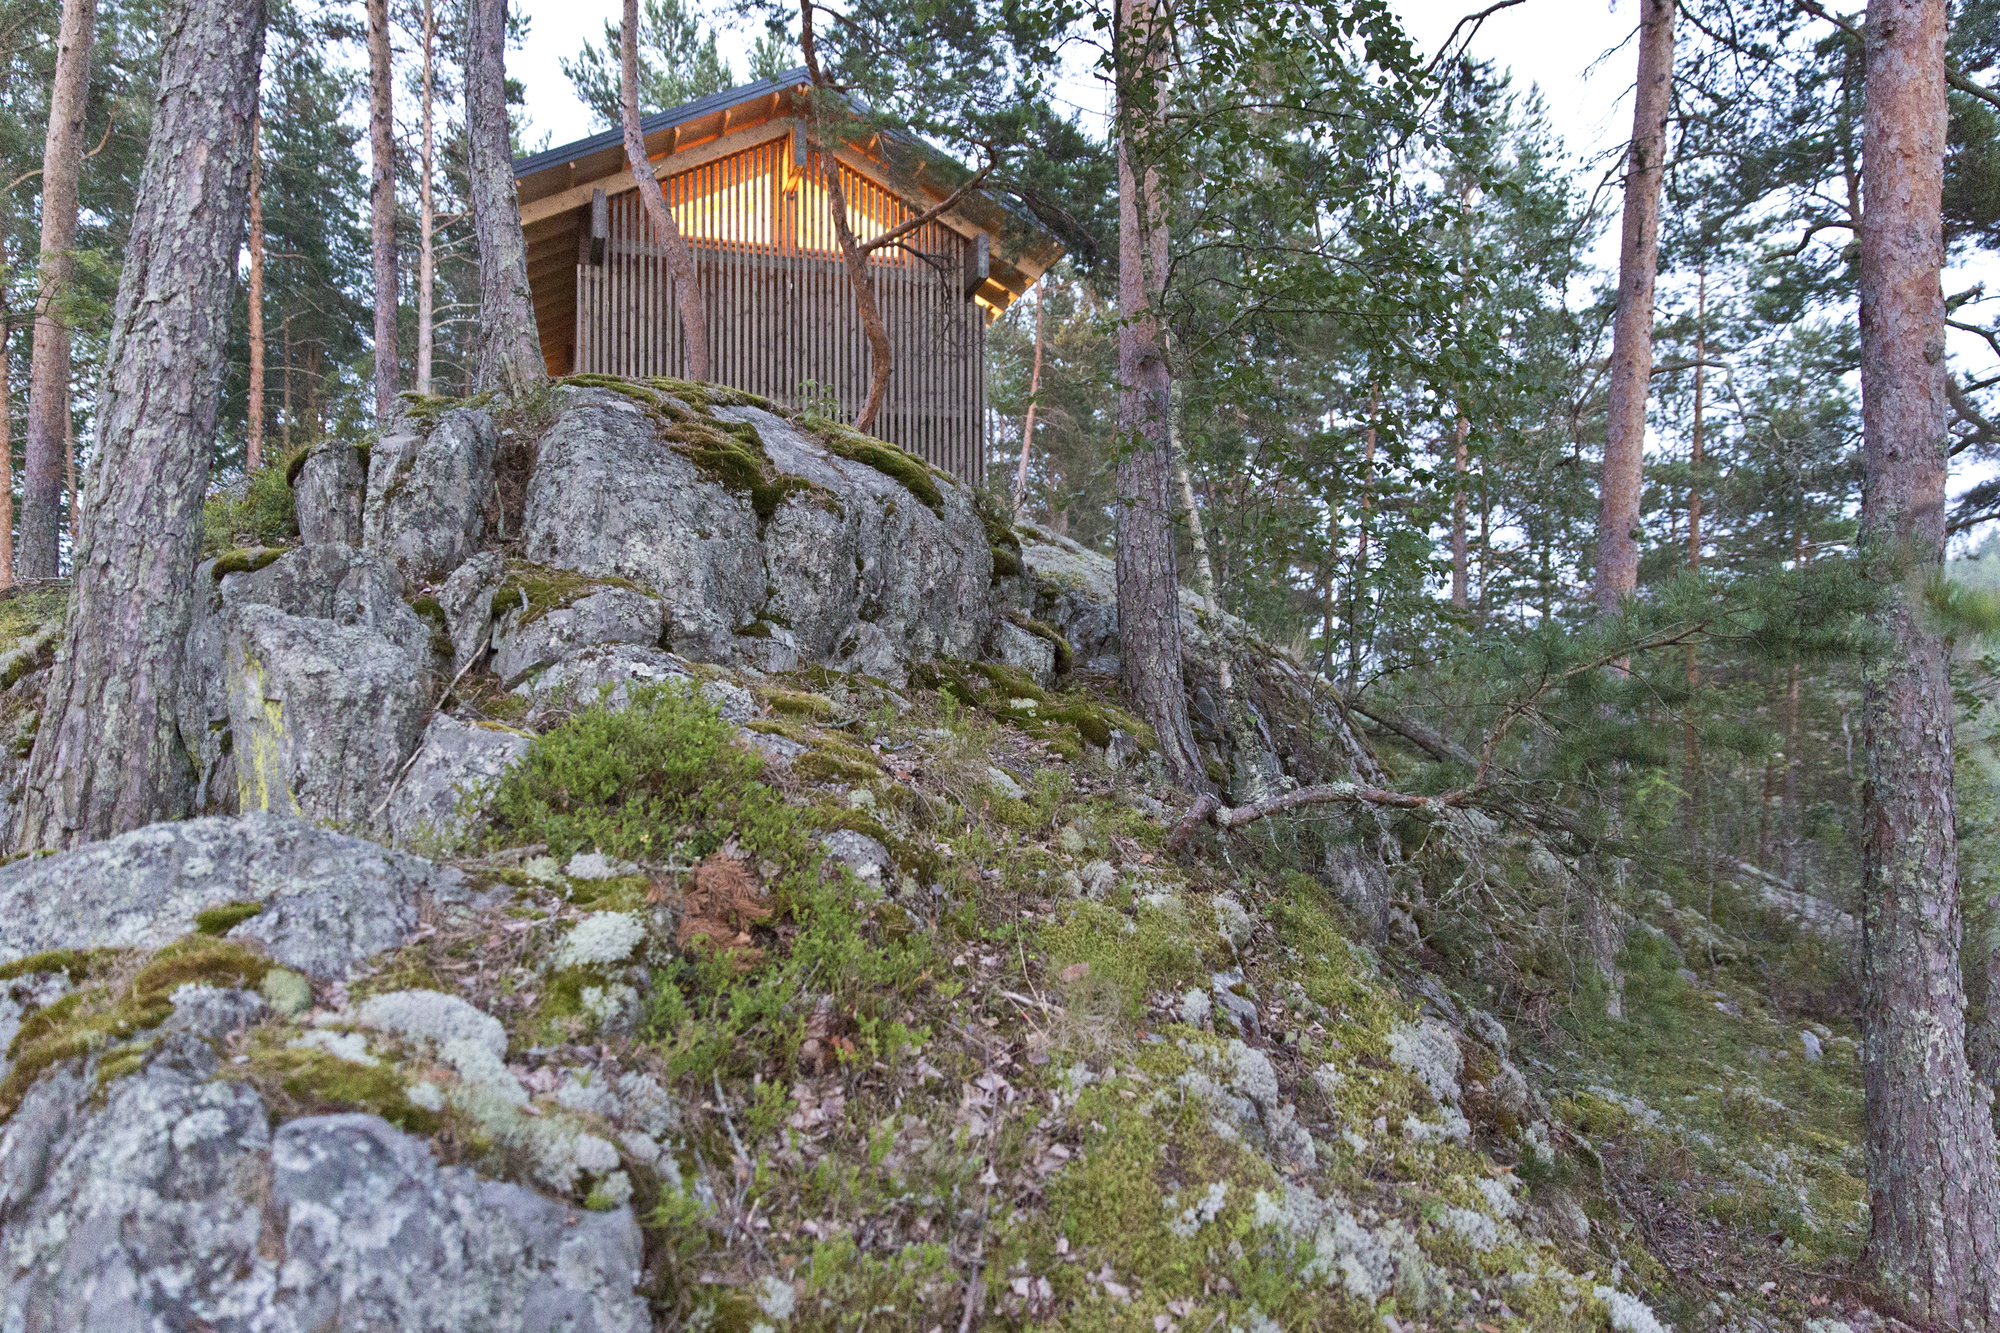 Gallery of cabin k studio kamppari 5 for 300 lake terrace